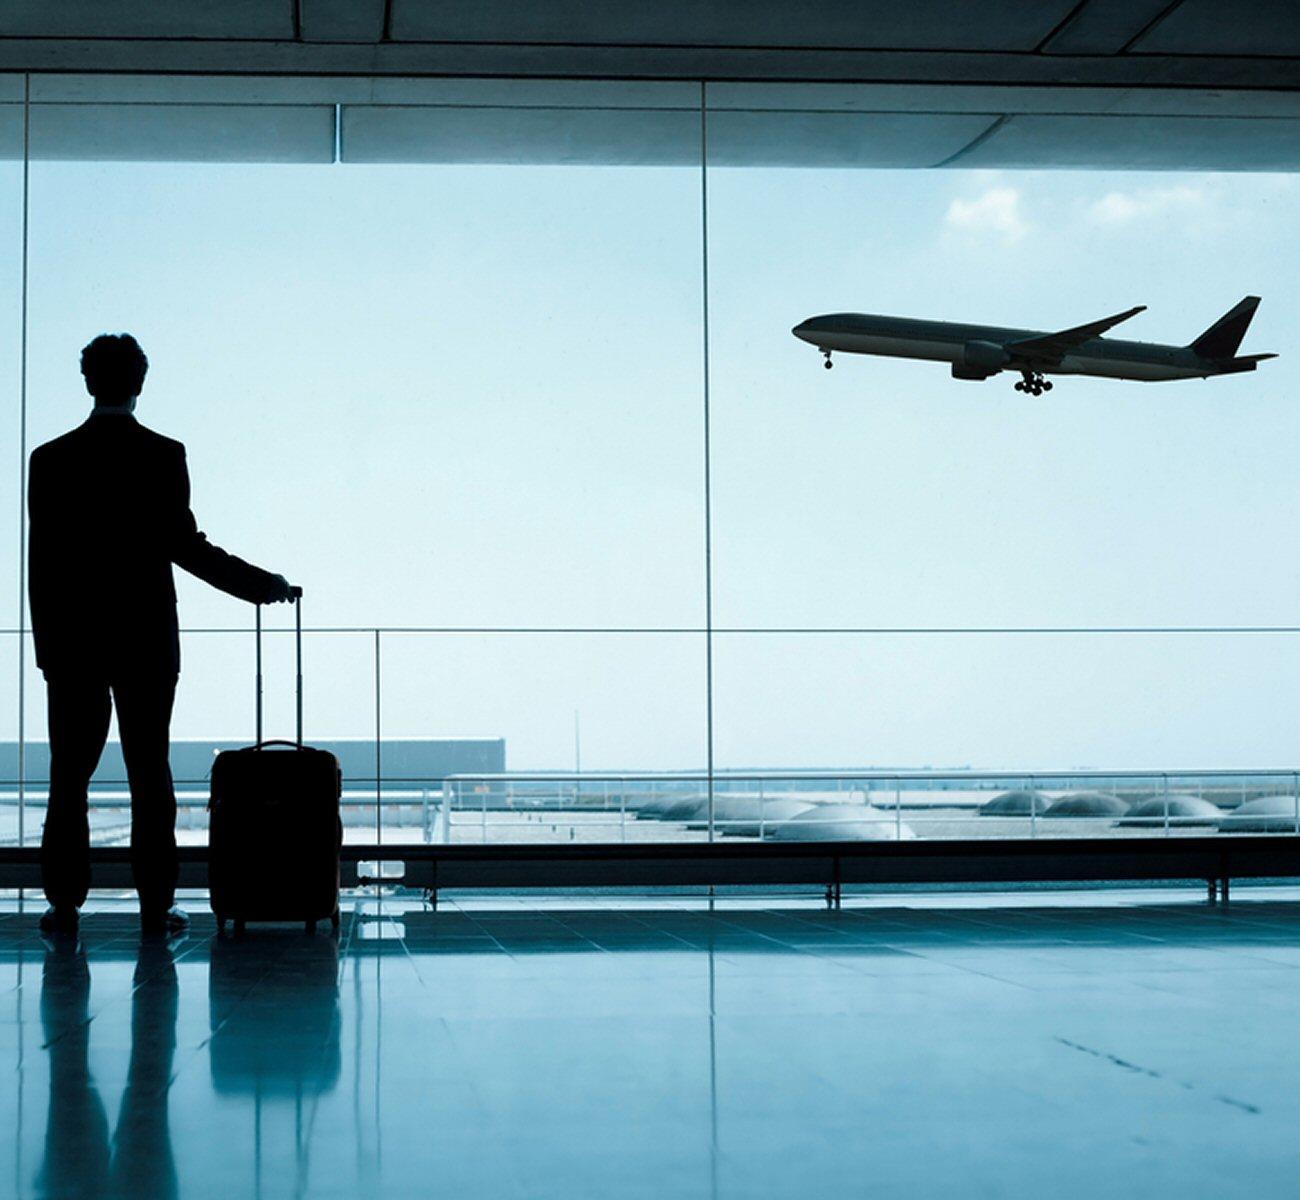 Best Methods for Airport Transport